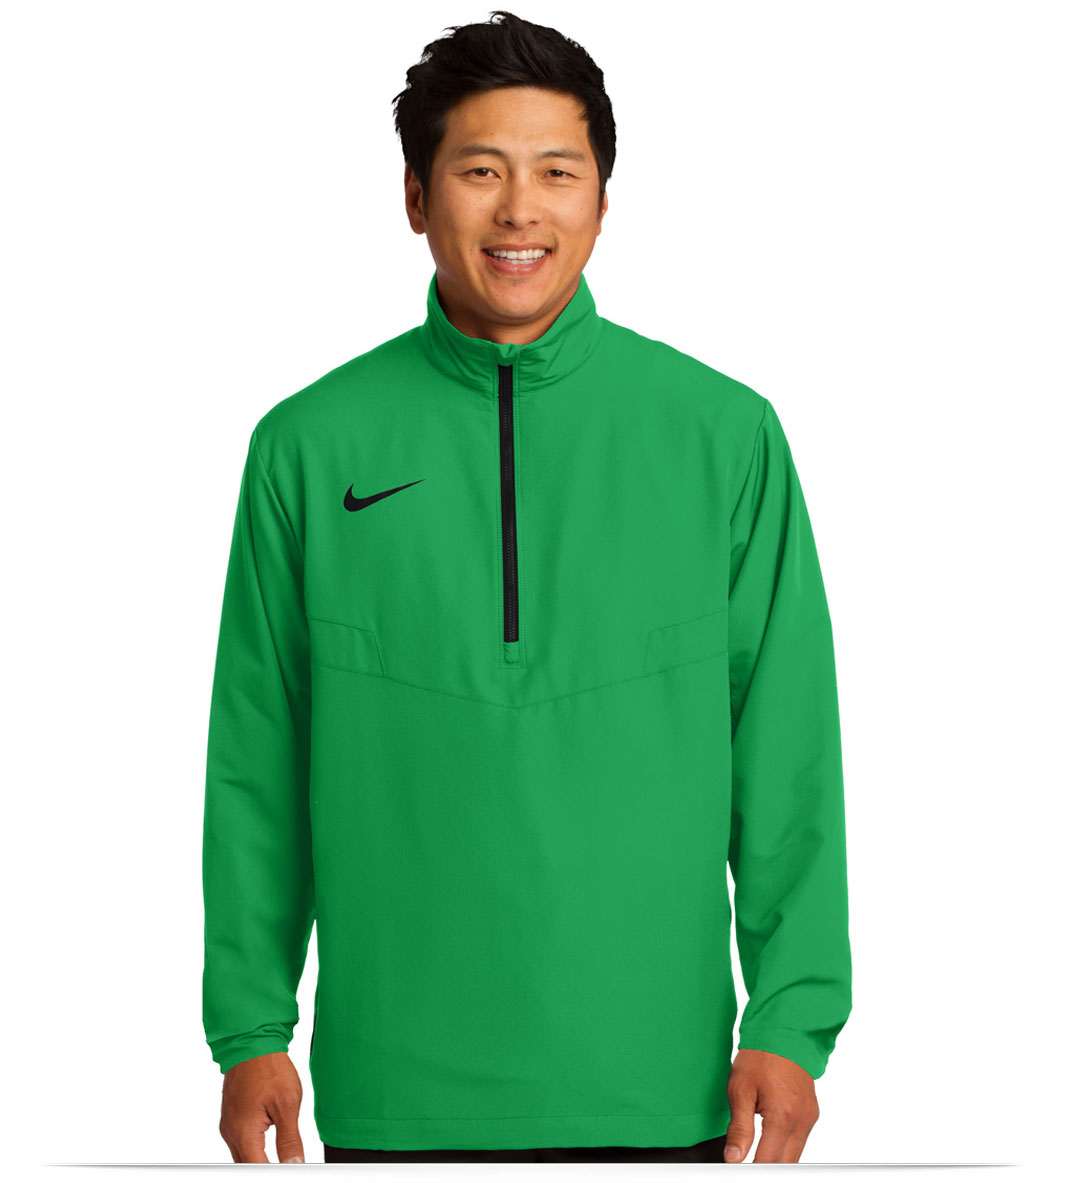 Customize Nike Golf Half-Zip Wind Shirt